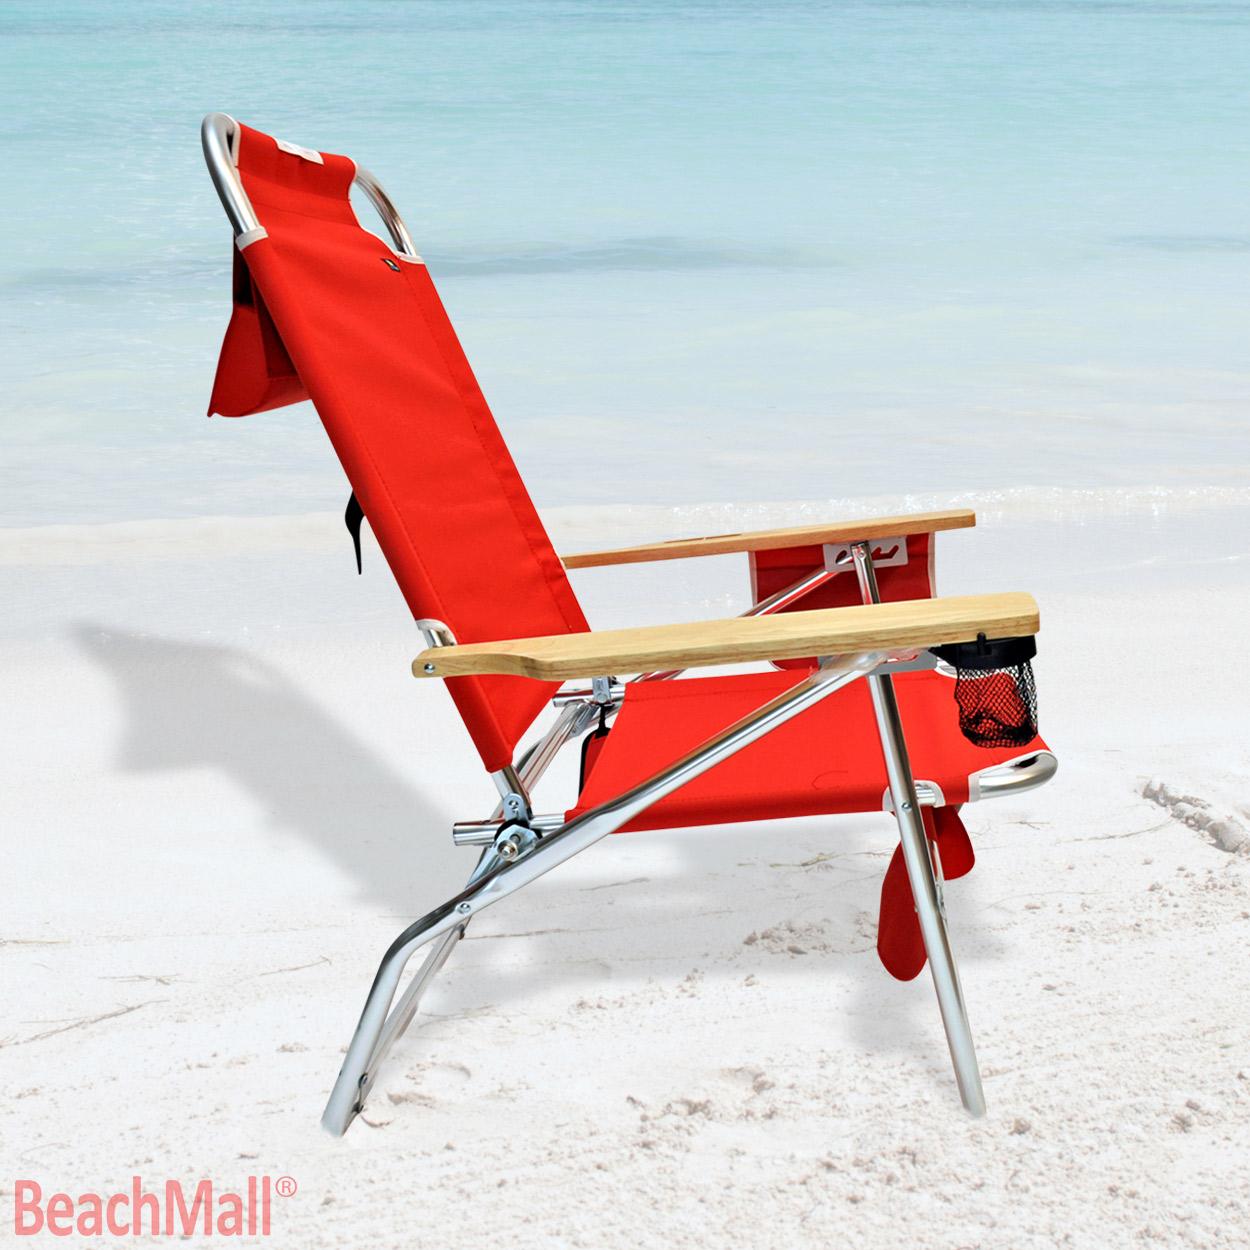 big and tall outdoor chairs 500lbs staples folding jumbo heavy duty 500 lbs xl aluminum beach chair for